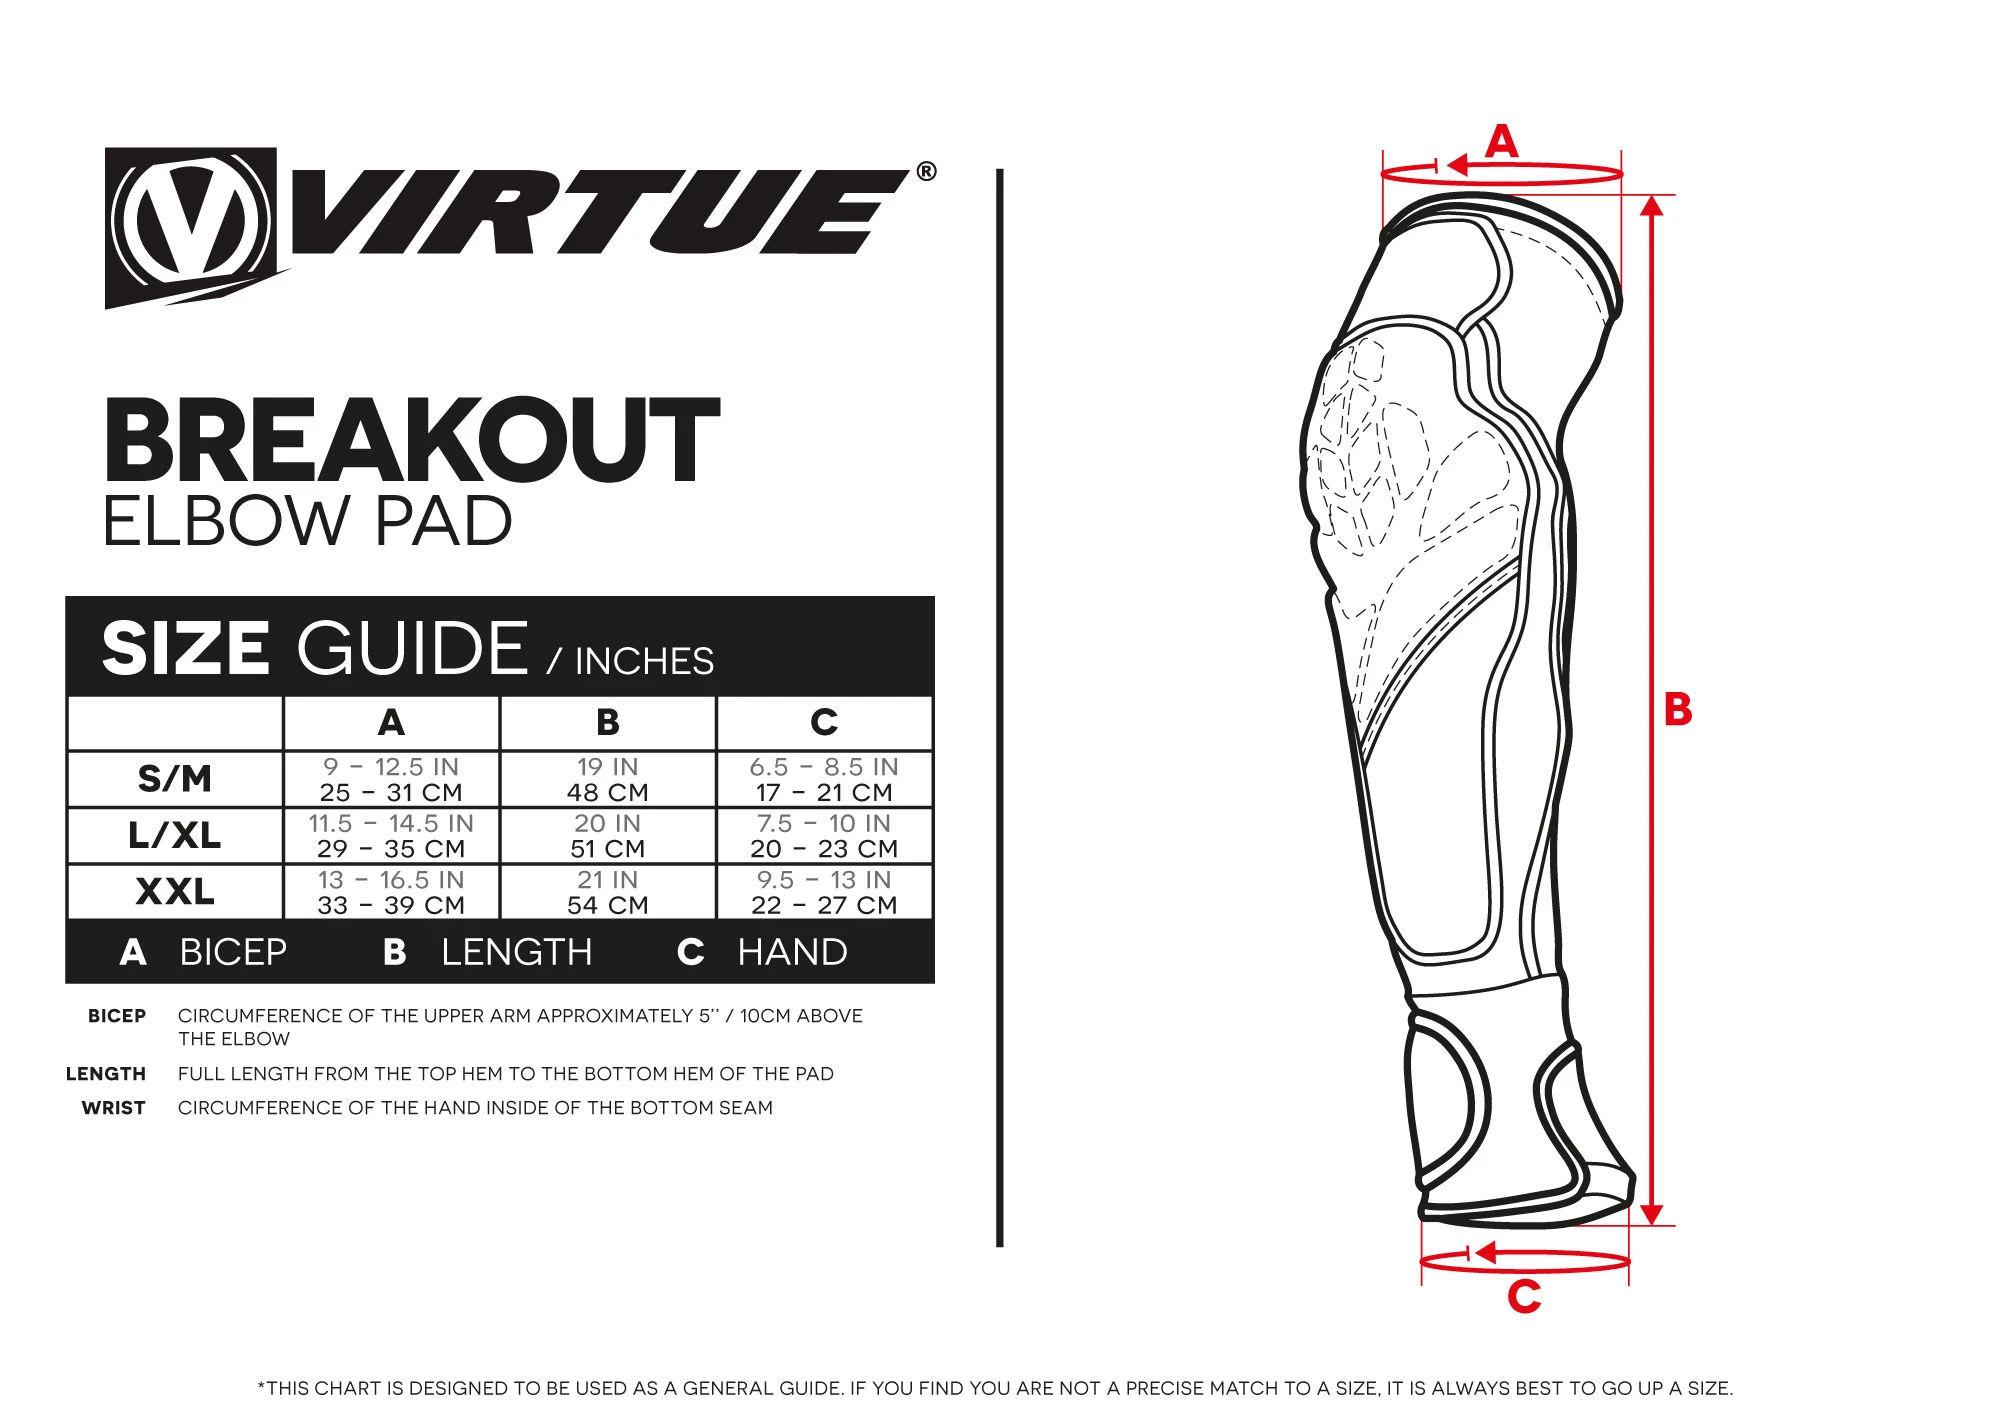 Virtue Breakout Elbow Pad